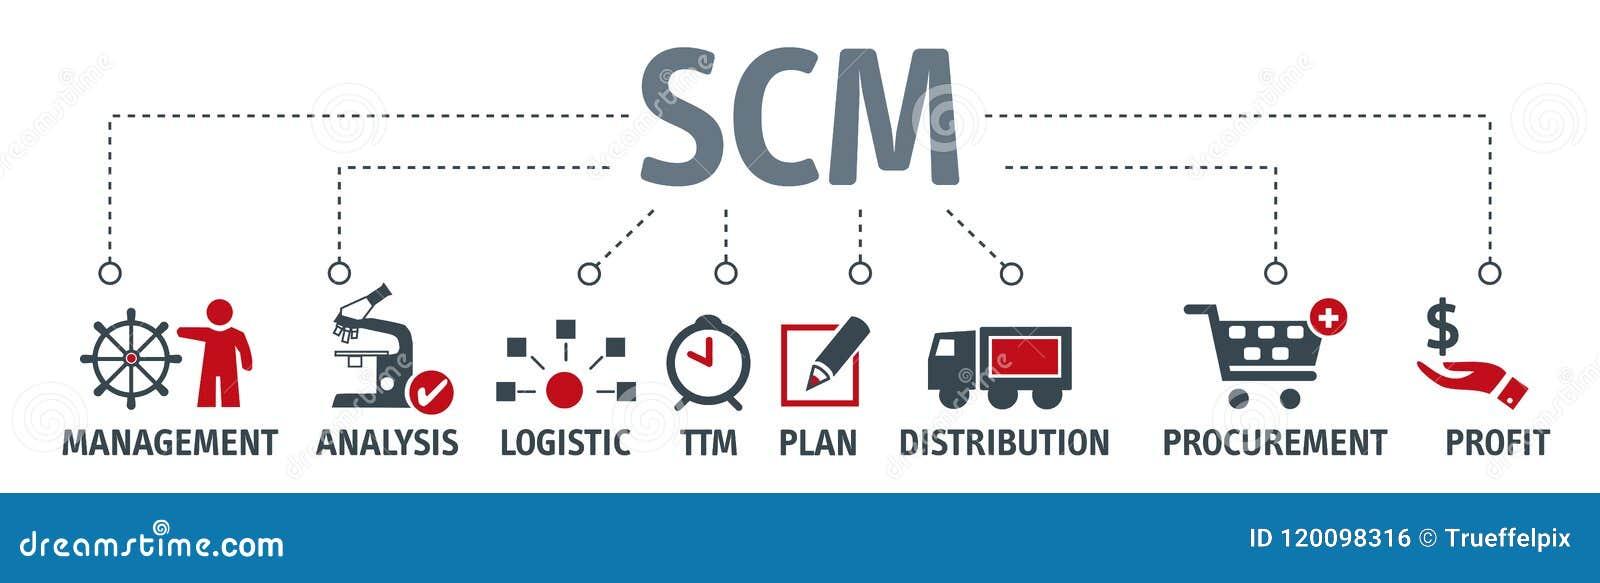 横幅供应链管理概念